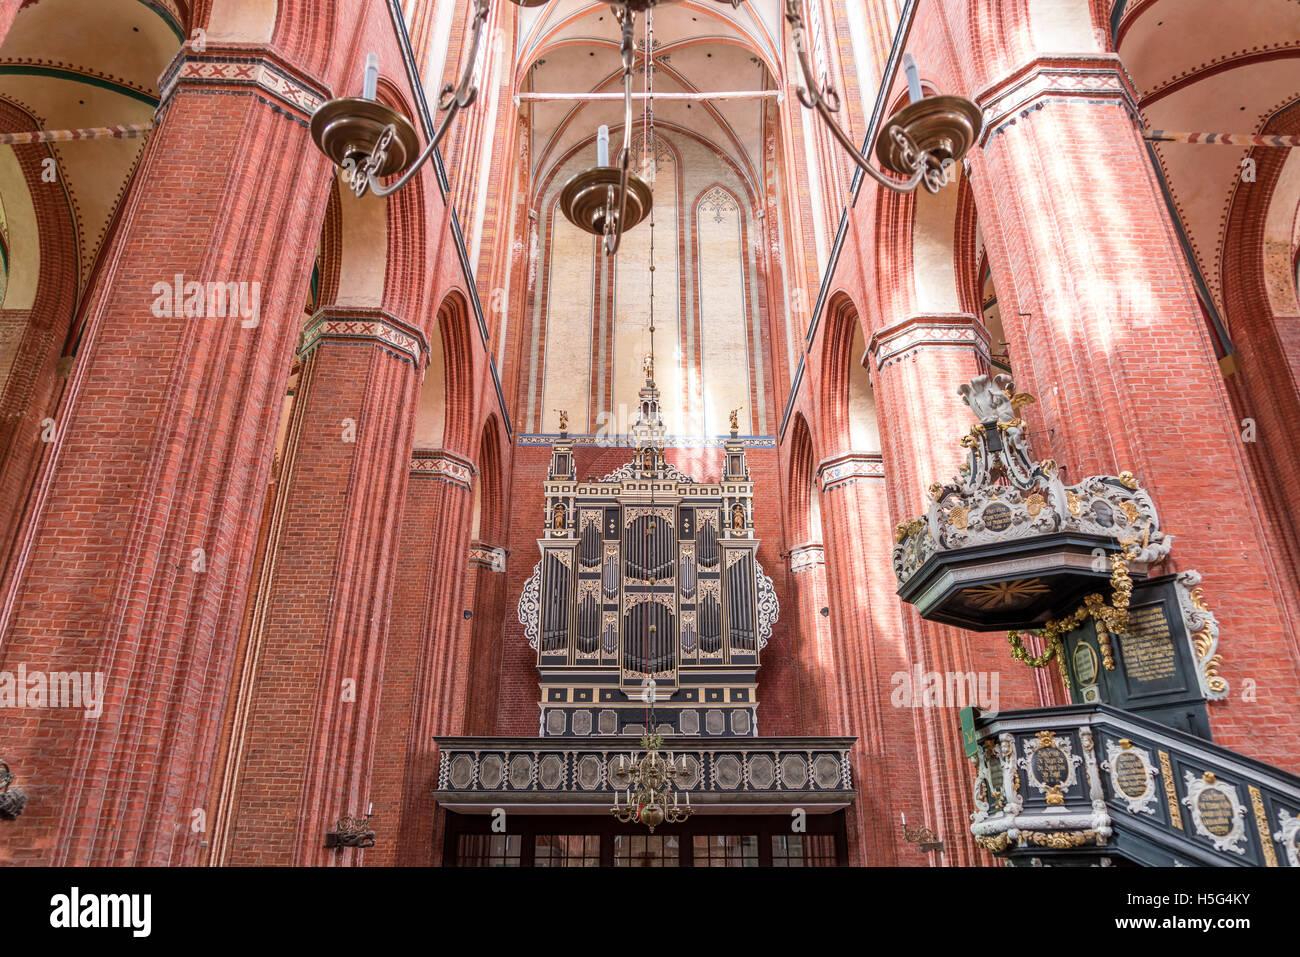 St. Nicholas interior and church organ, Hanseatic City of Wismar, Mecklenburg-Vorpommern, Germany - Stock Image